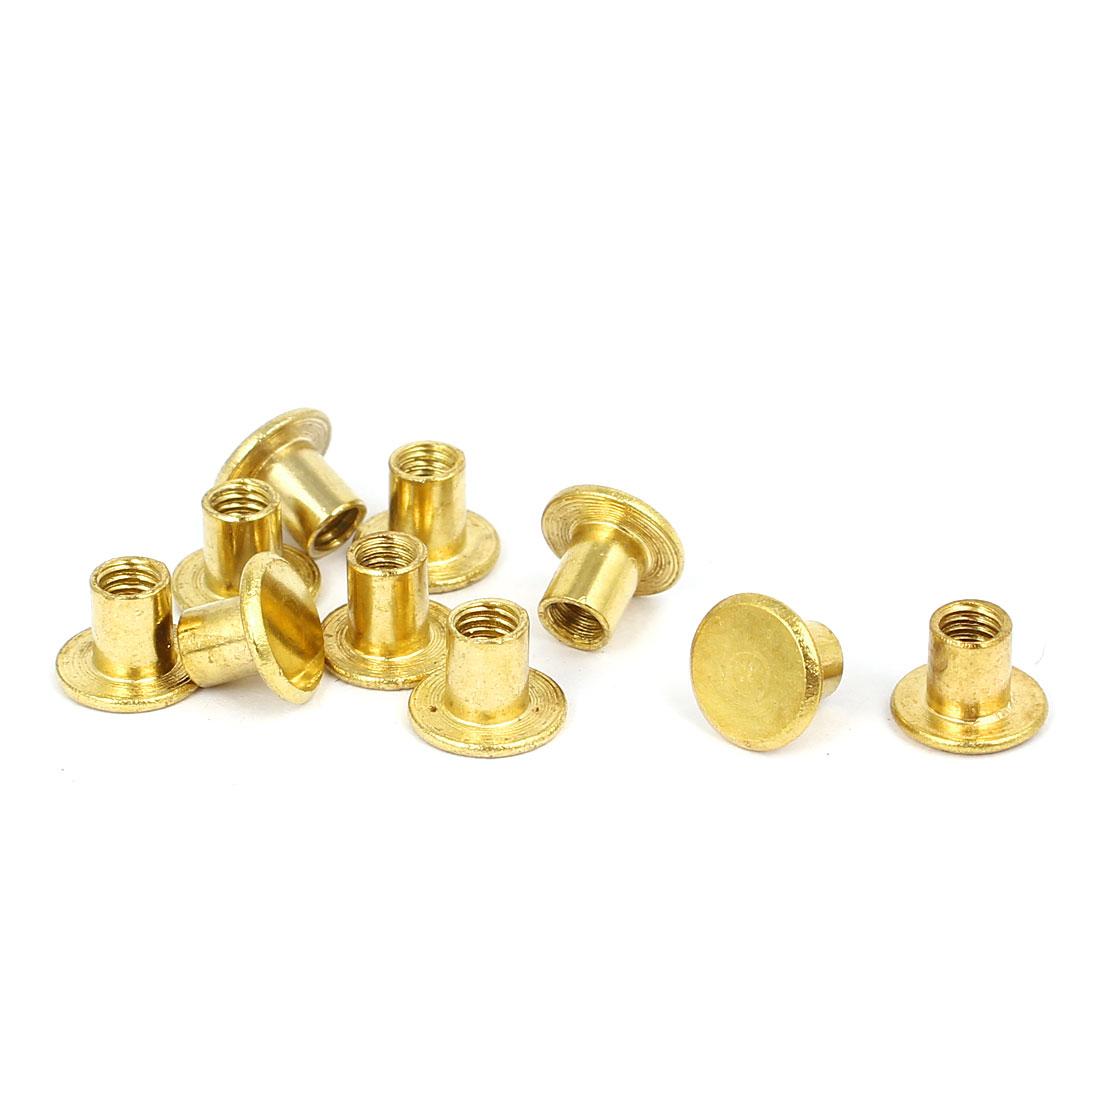 Photo Album Metal Brass Plated Binding Screw Post Barrel Nut 5mmx5.5mm 10pcs